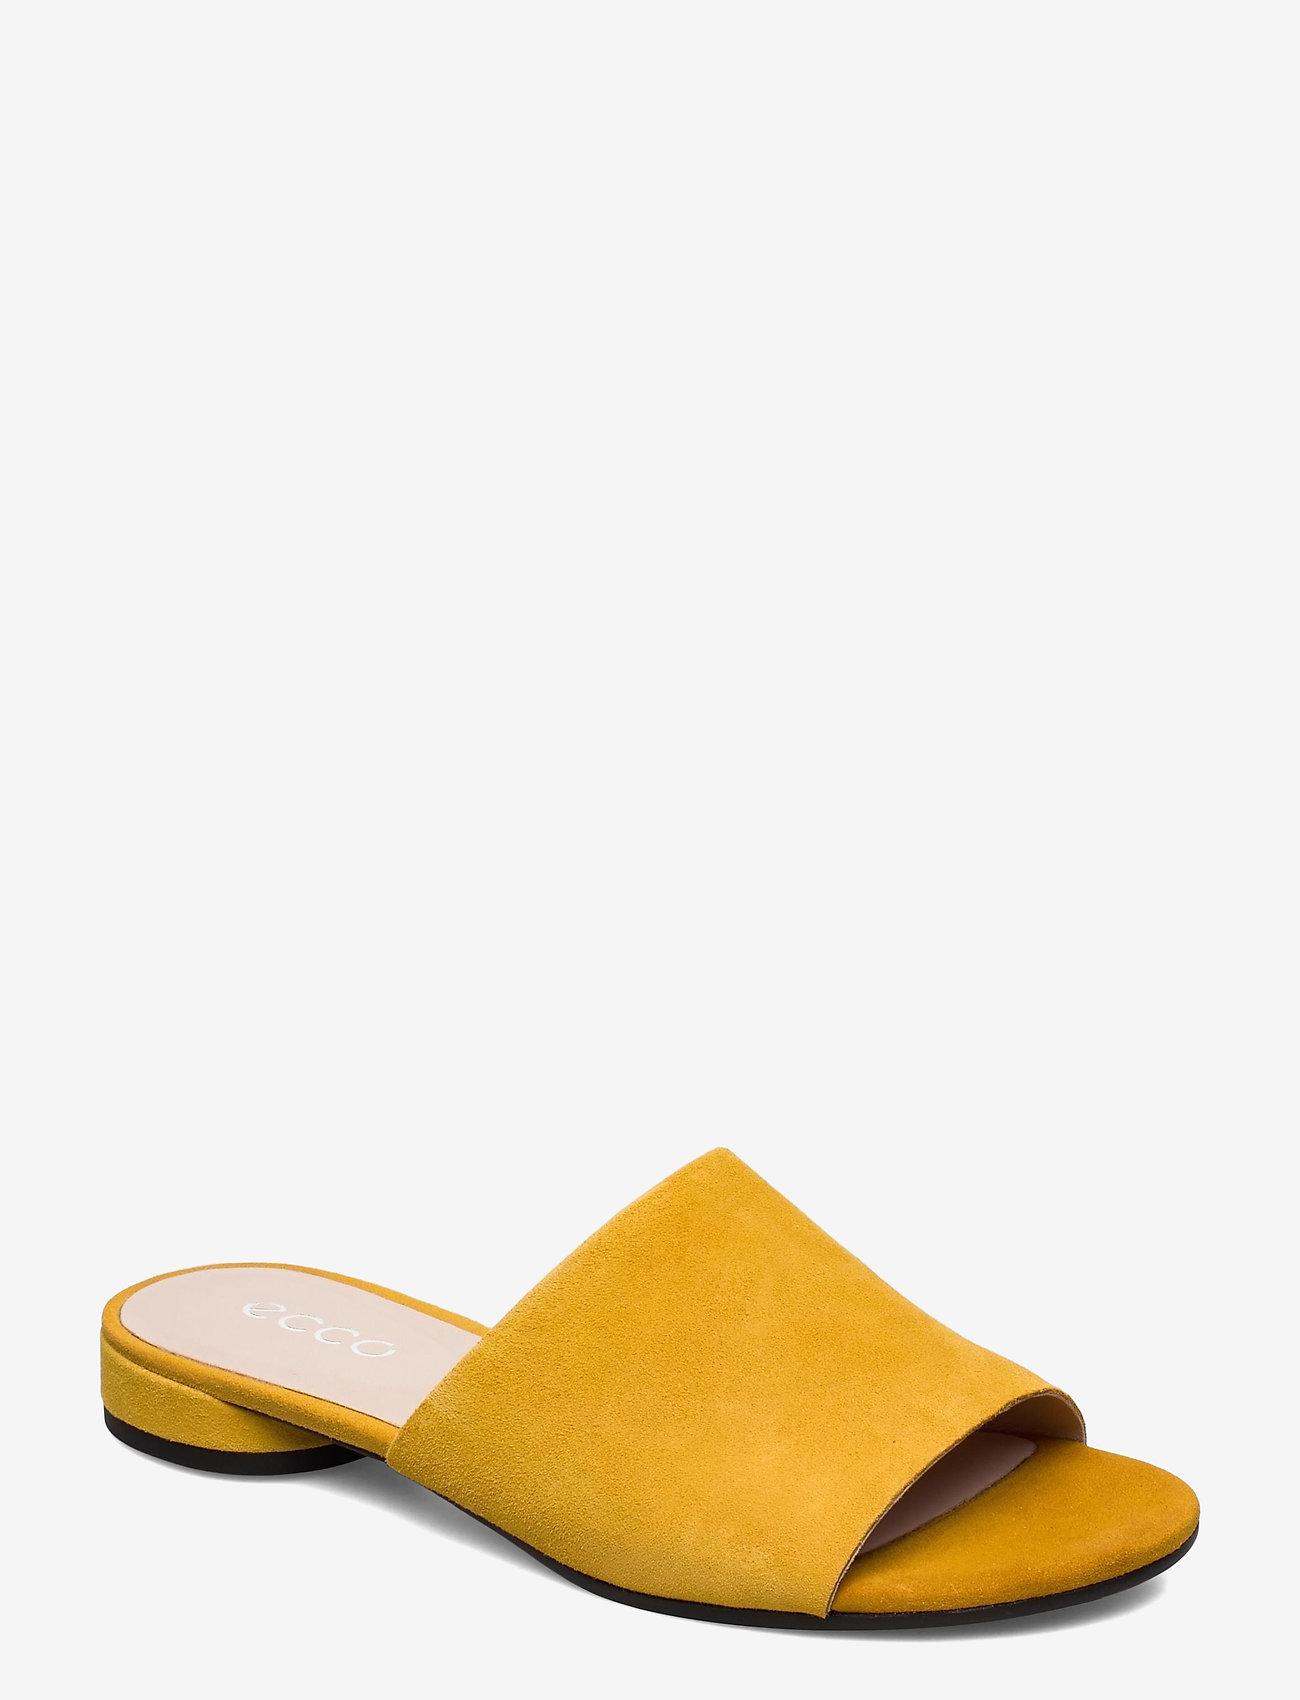 ECCO - W FLAT SANDAL II - flat sandals - merigold - 0